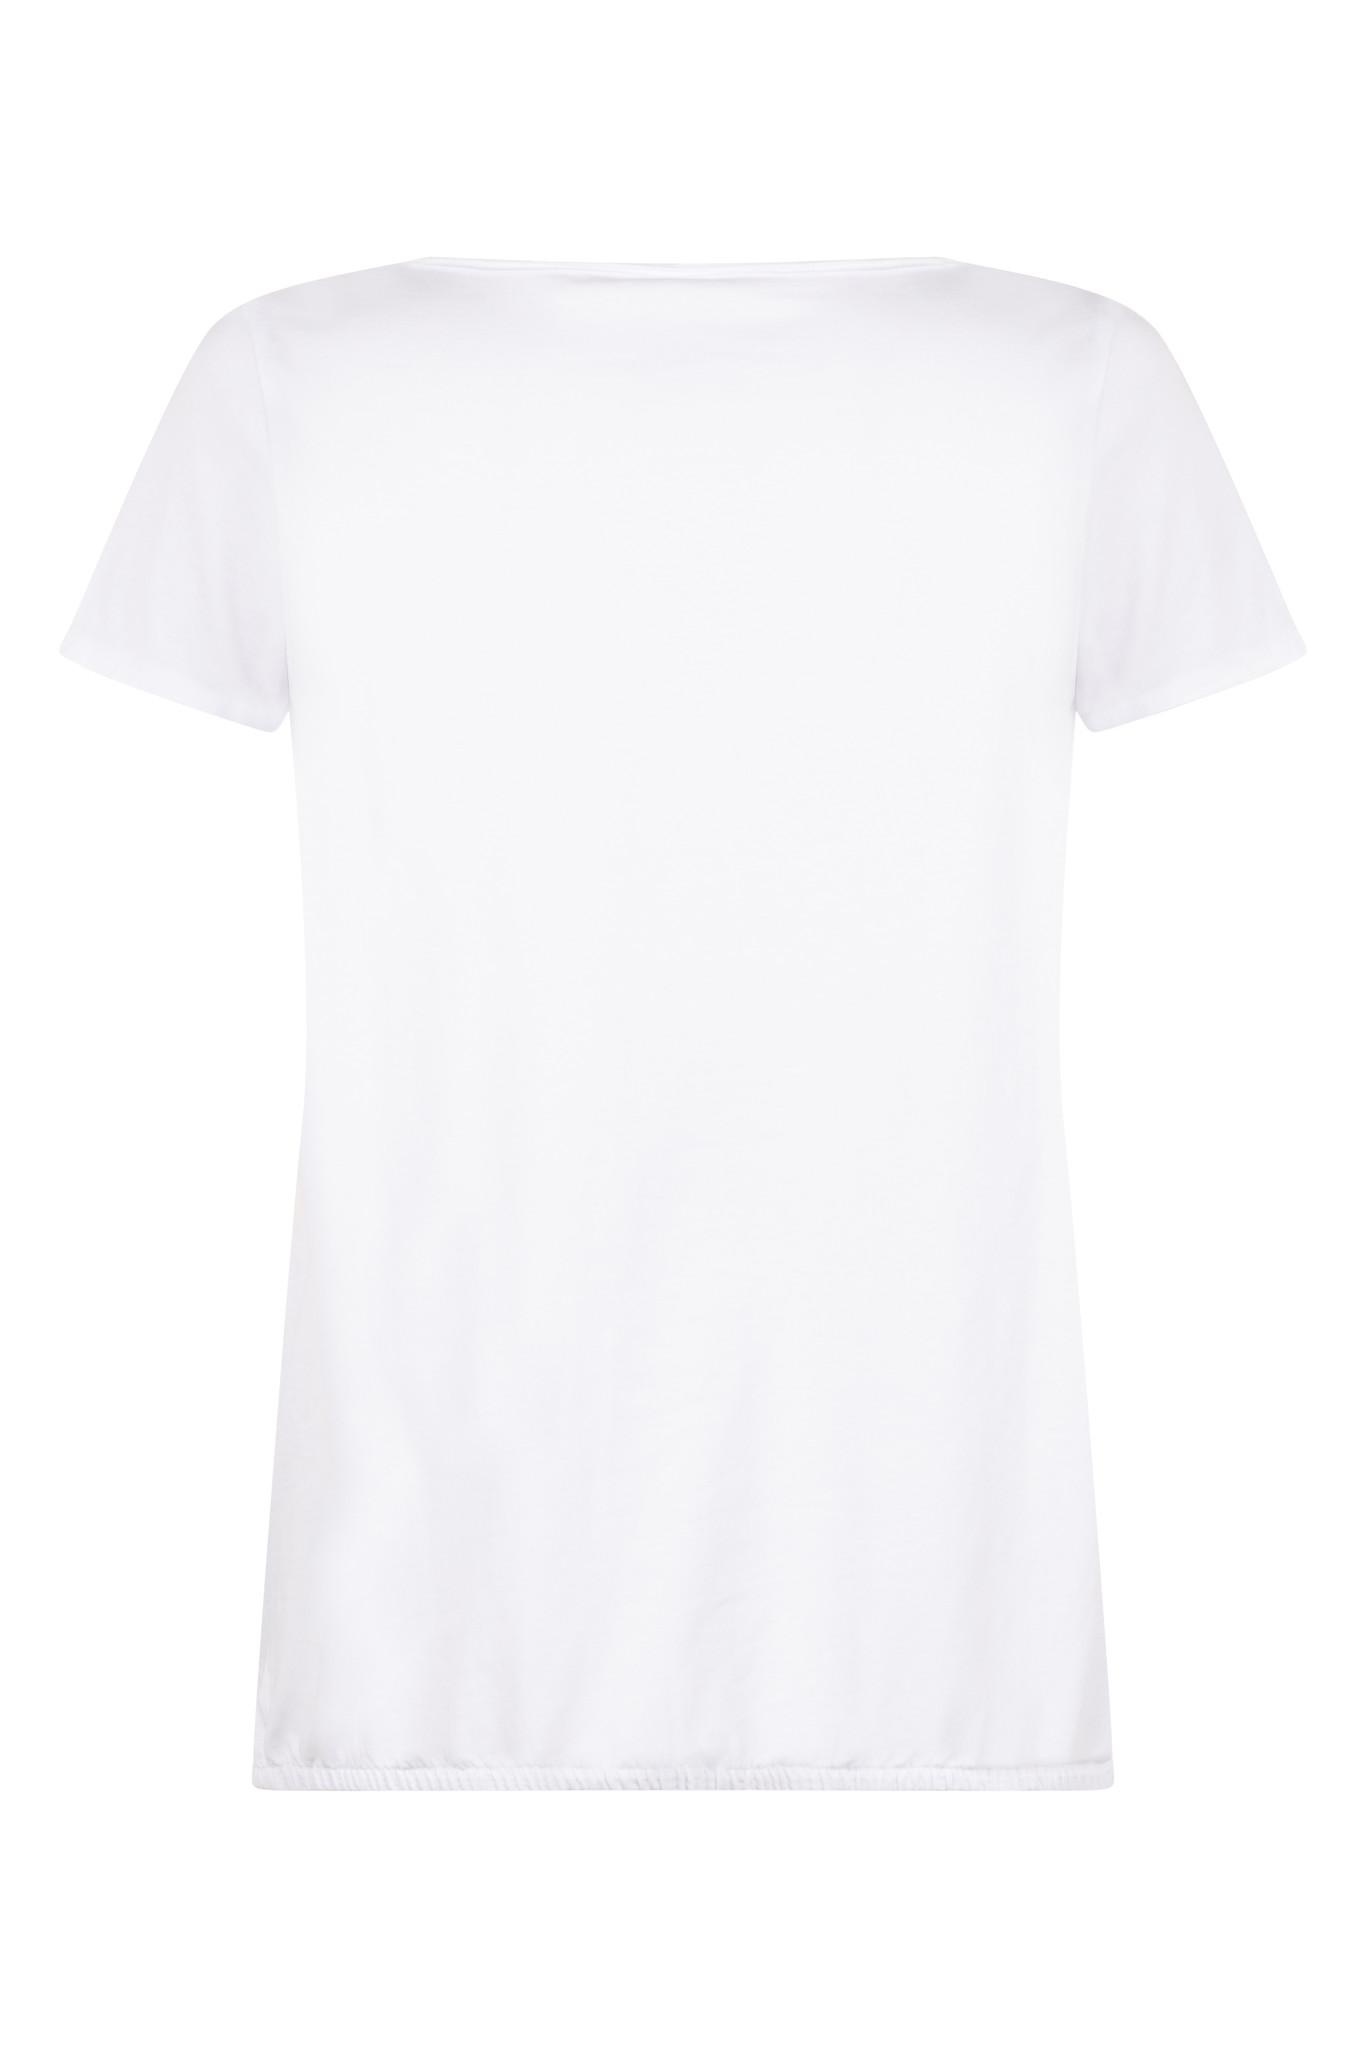 Zoso Zoso Daisy T-shirt with print